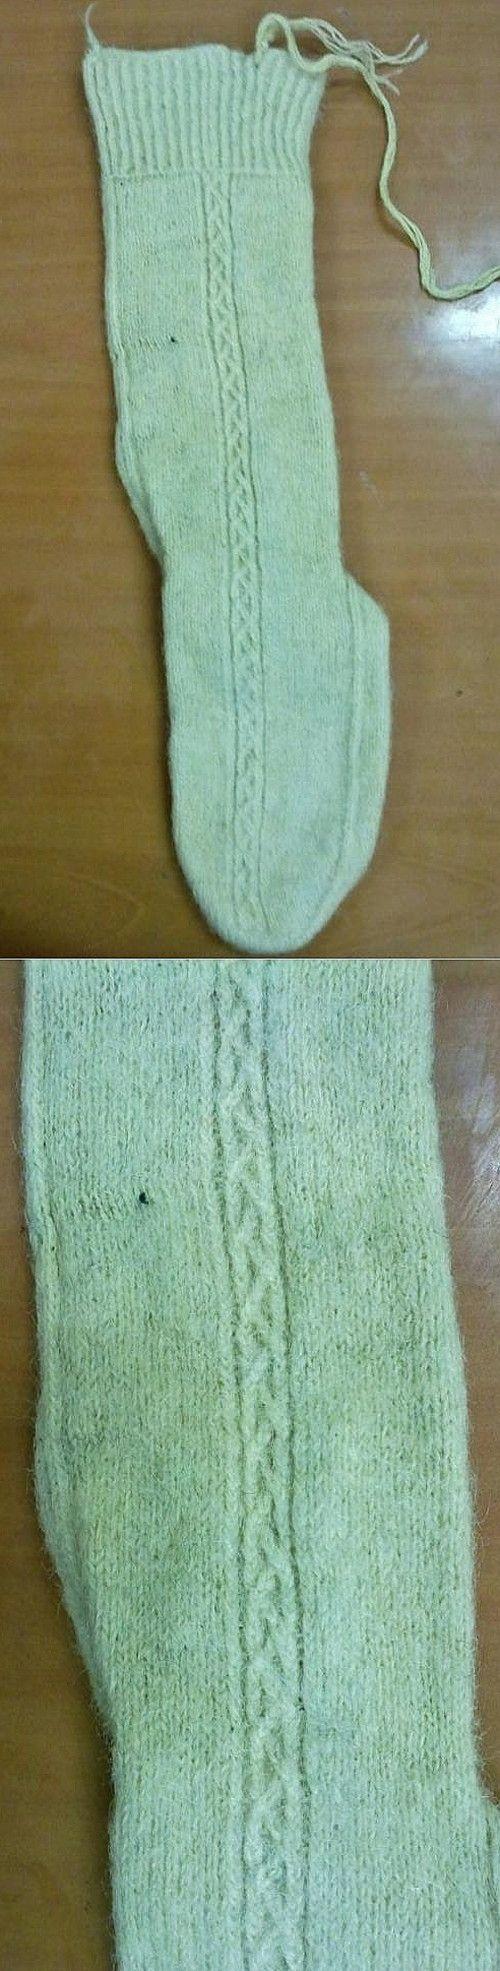 Traditional hand-knitted woollen socks, for women. From the Malatya province. Late 20th century. Source: Halk Eğitim Merkezi, Malatya.